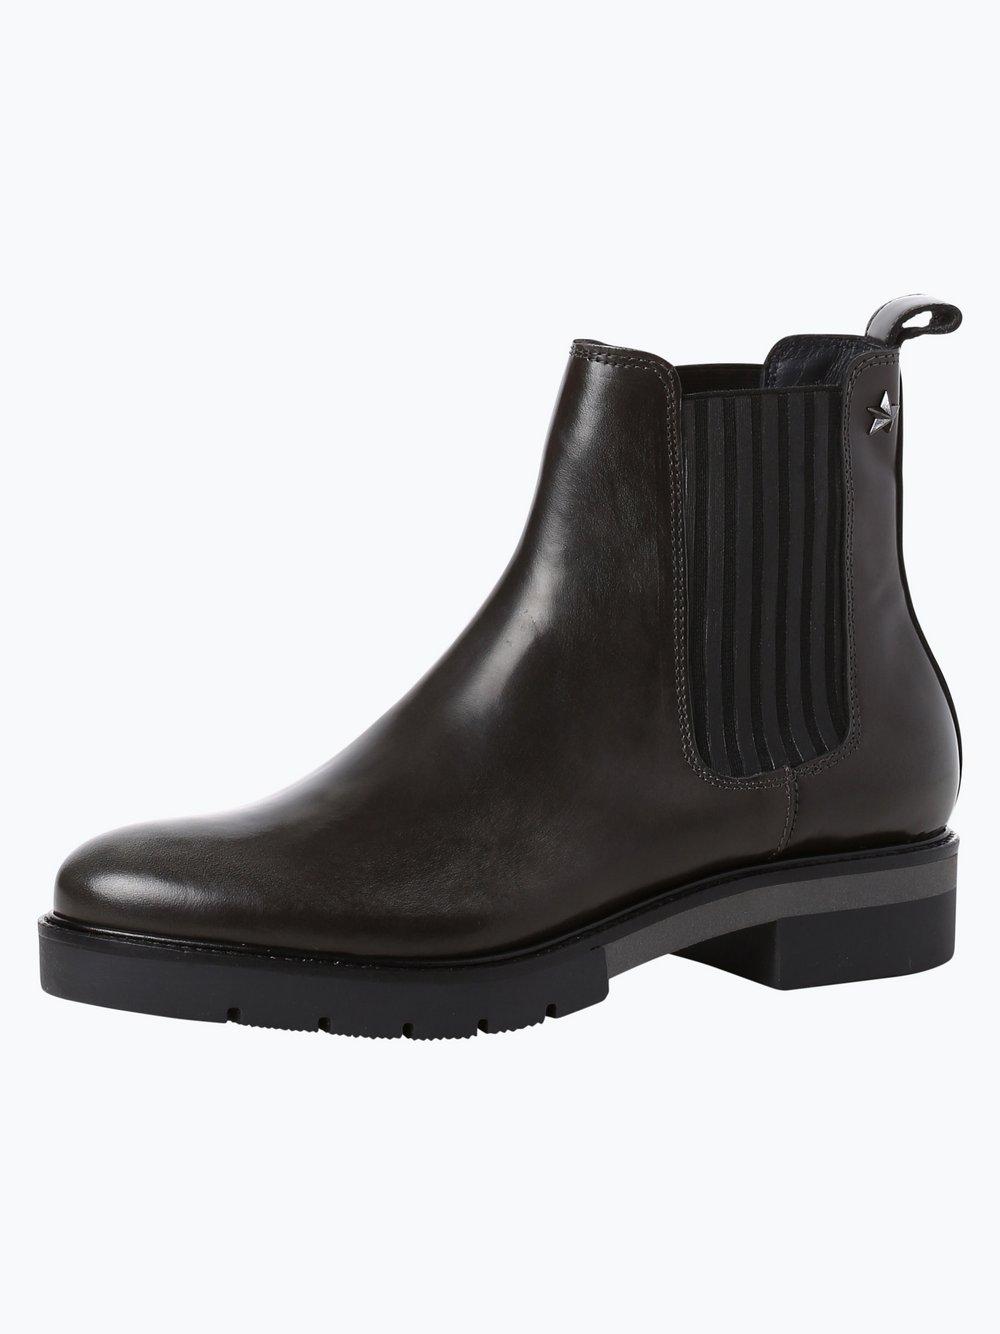 Tommy Hilfiger Damen Chelsea Boots aus Leder Roxana online